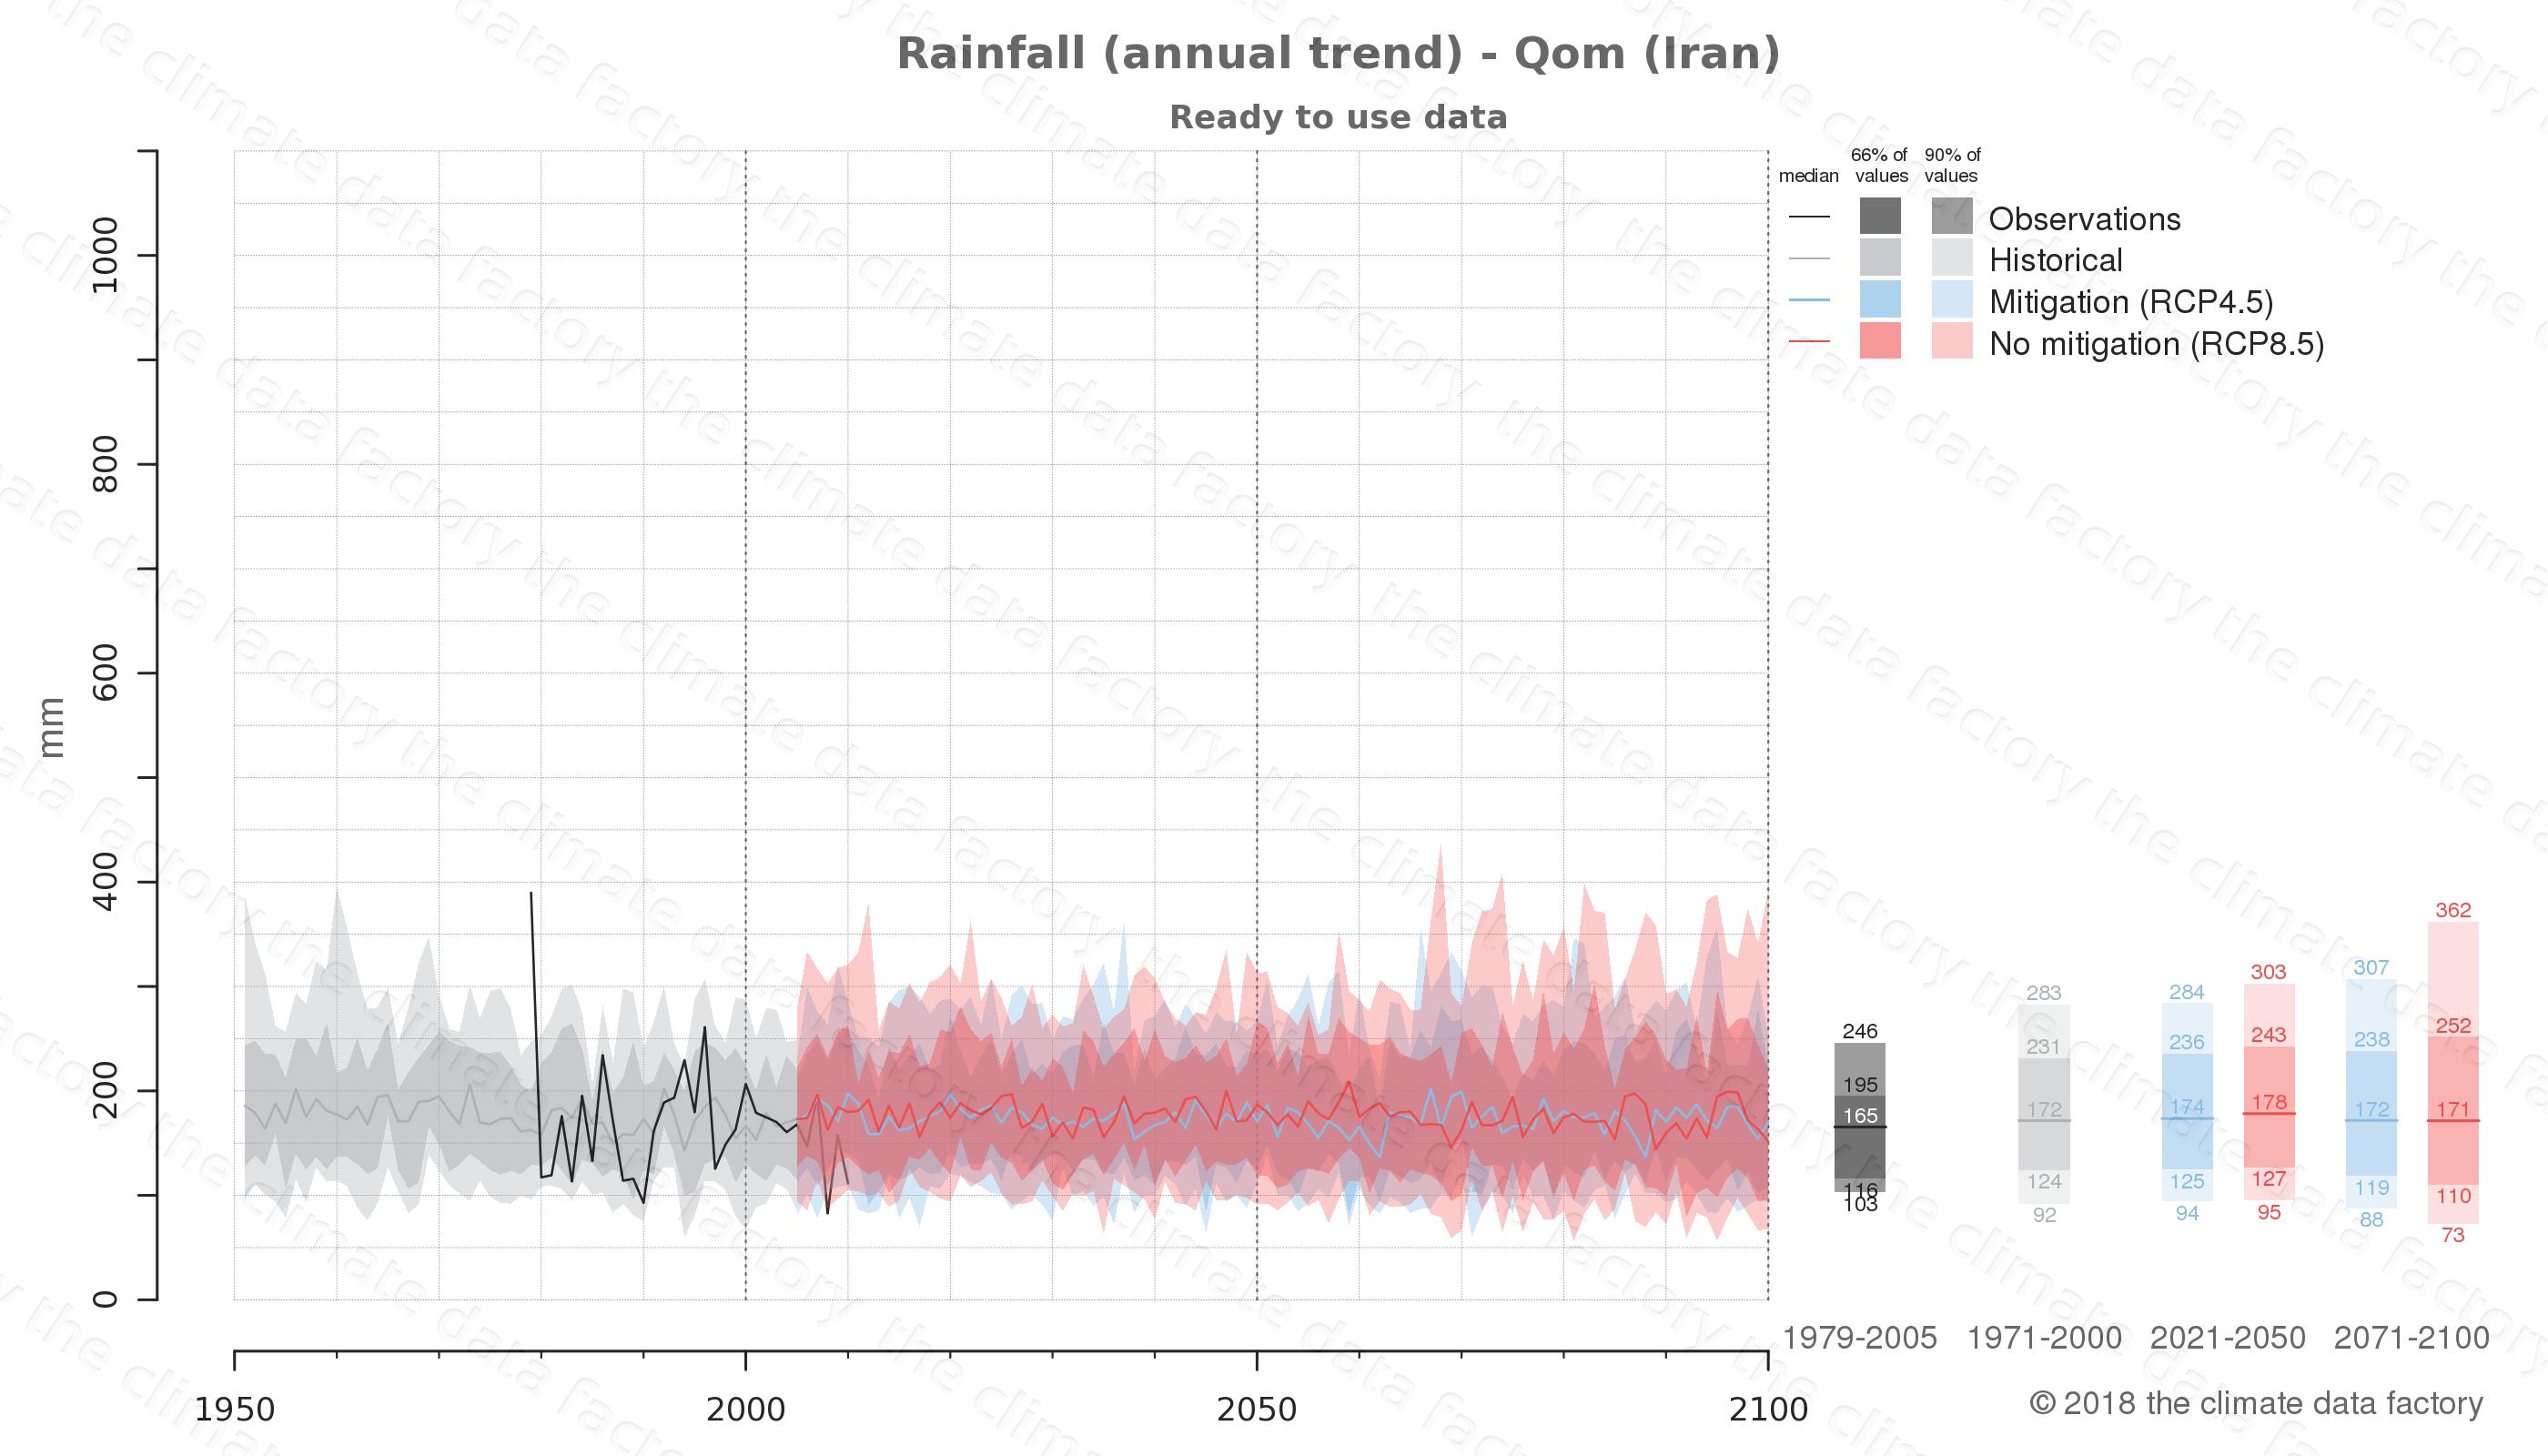 climate change data policy adaptation climate graph city data rainfall qom iran